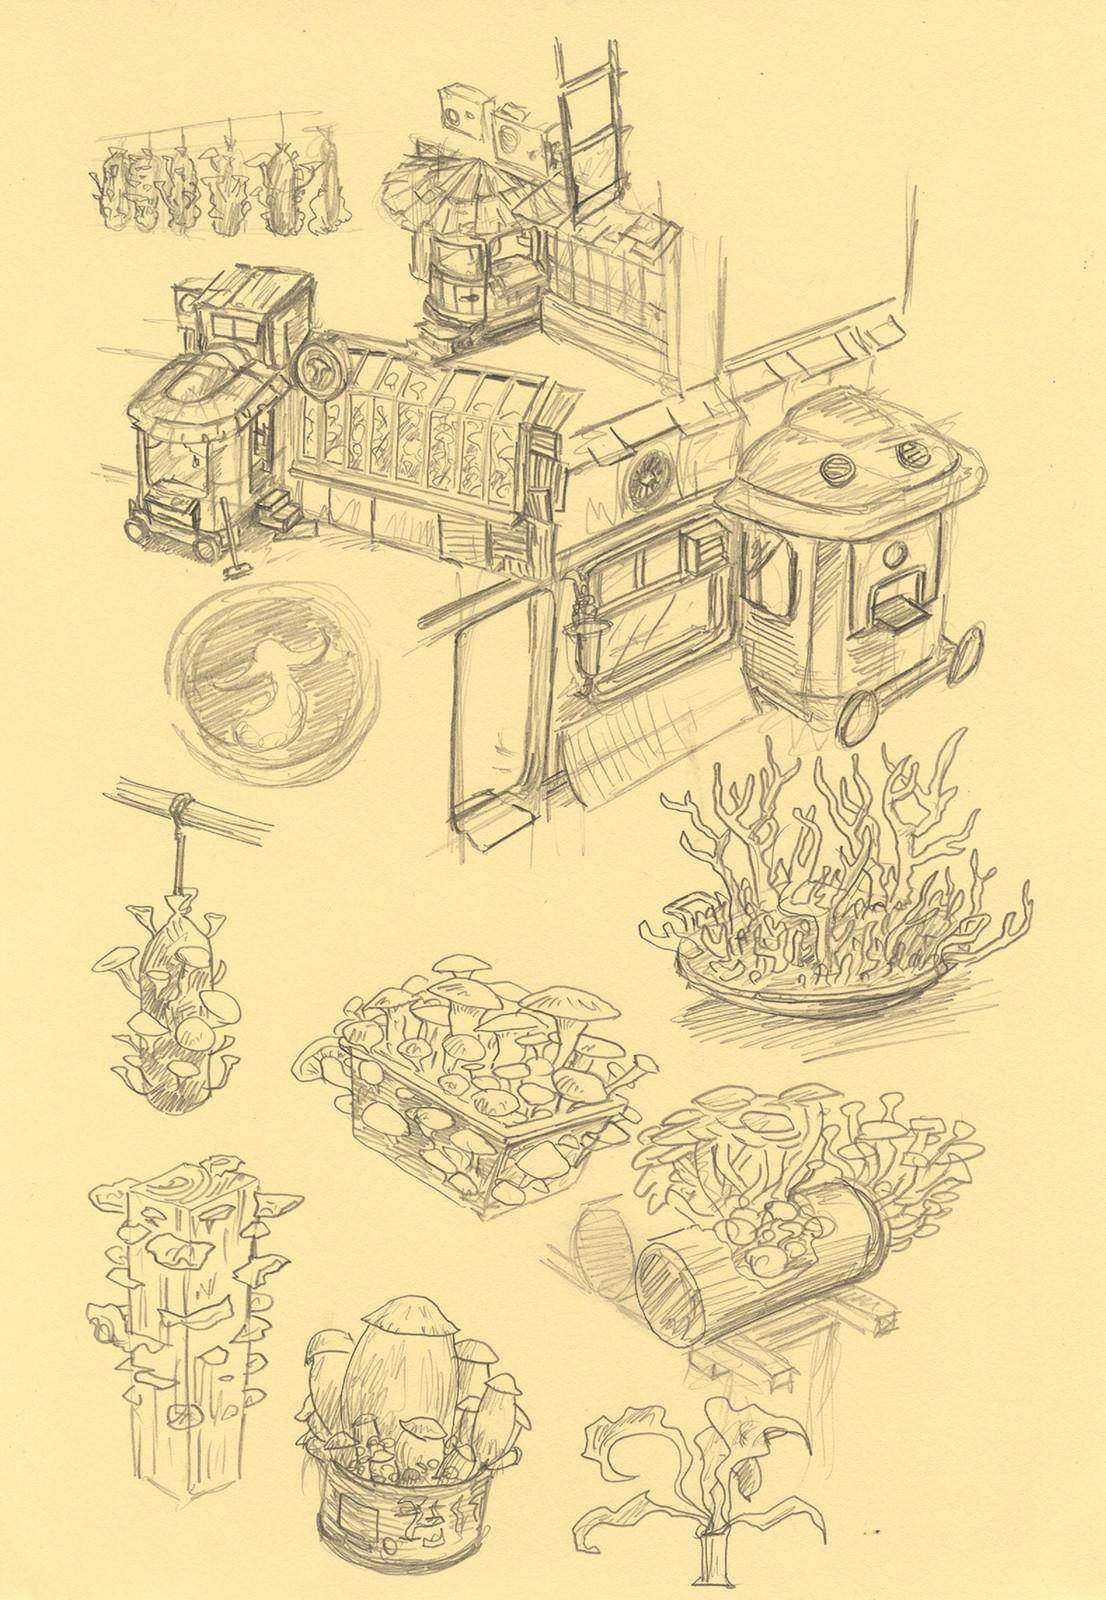 The mushroom shop concept drawing